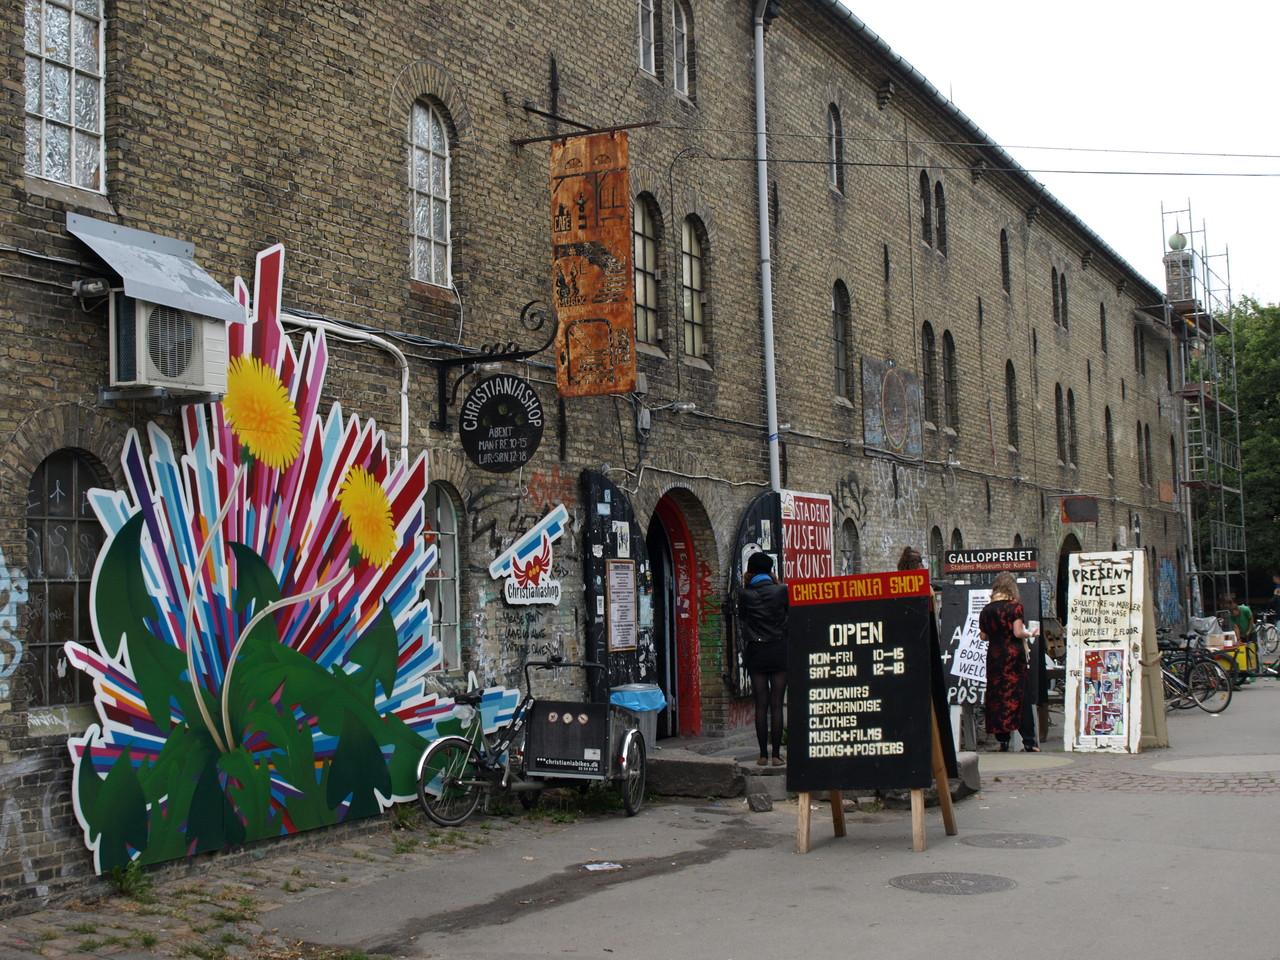 die alternative Stadt Christiania